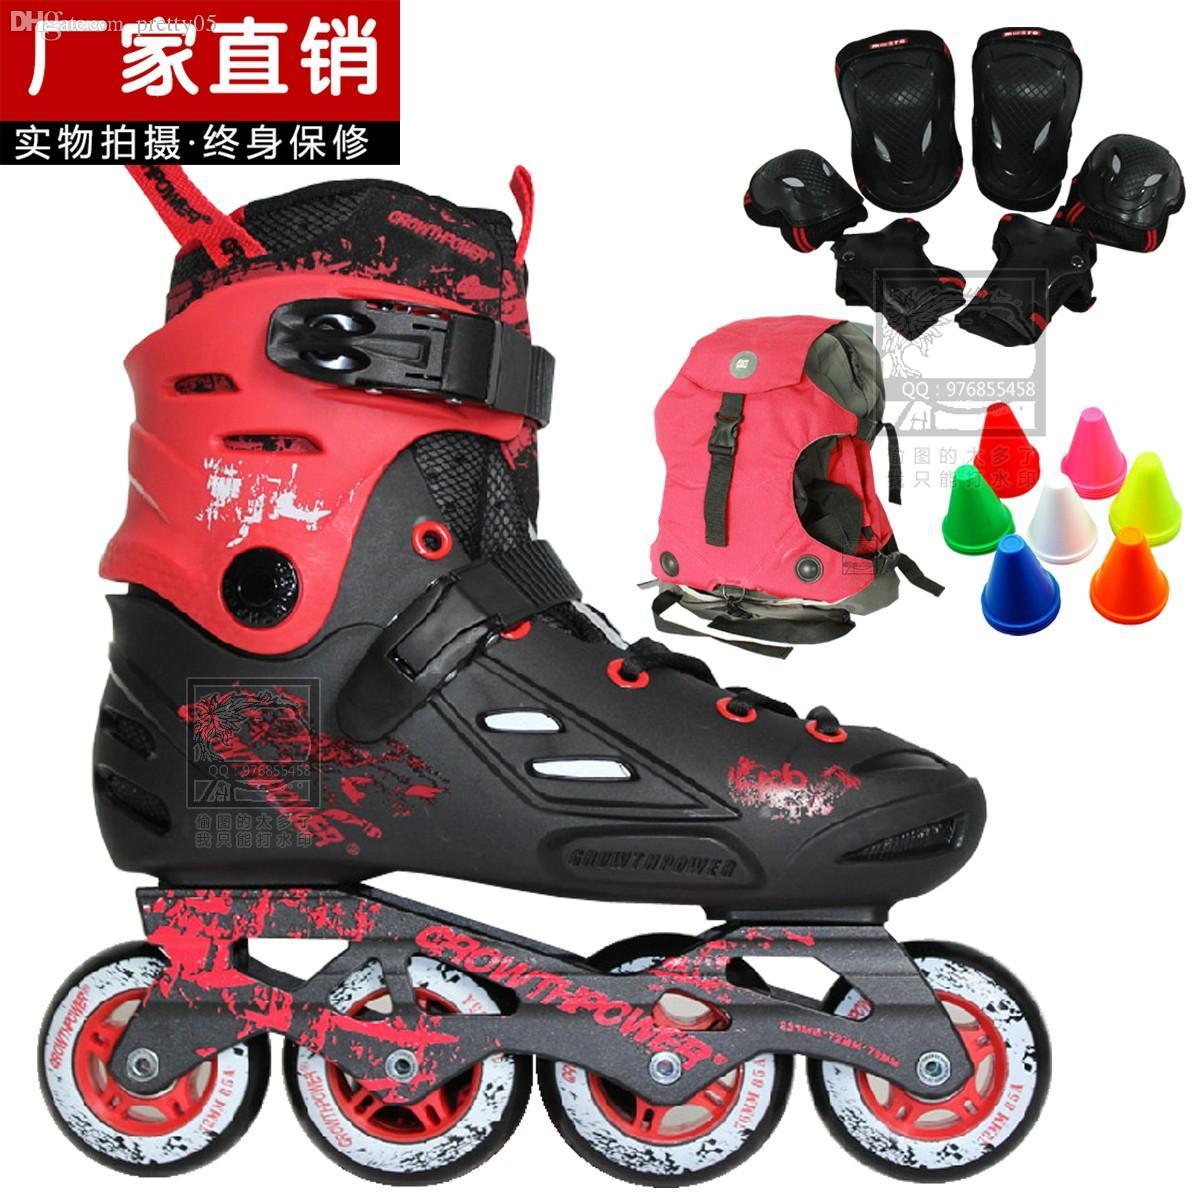 Roller skating shoes buy online - Online Cheap Wholesale Adult A6 Skatse Roller Skates Skating Shoes A6 Skating Shoes Slalom Skates By Pretty05 Dhgate Com